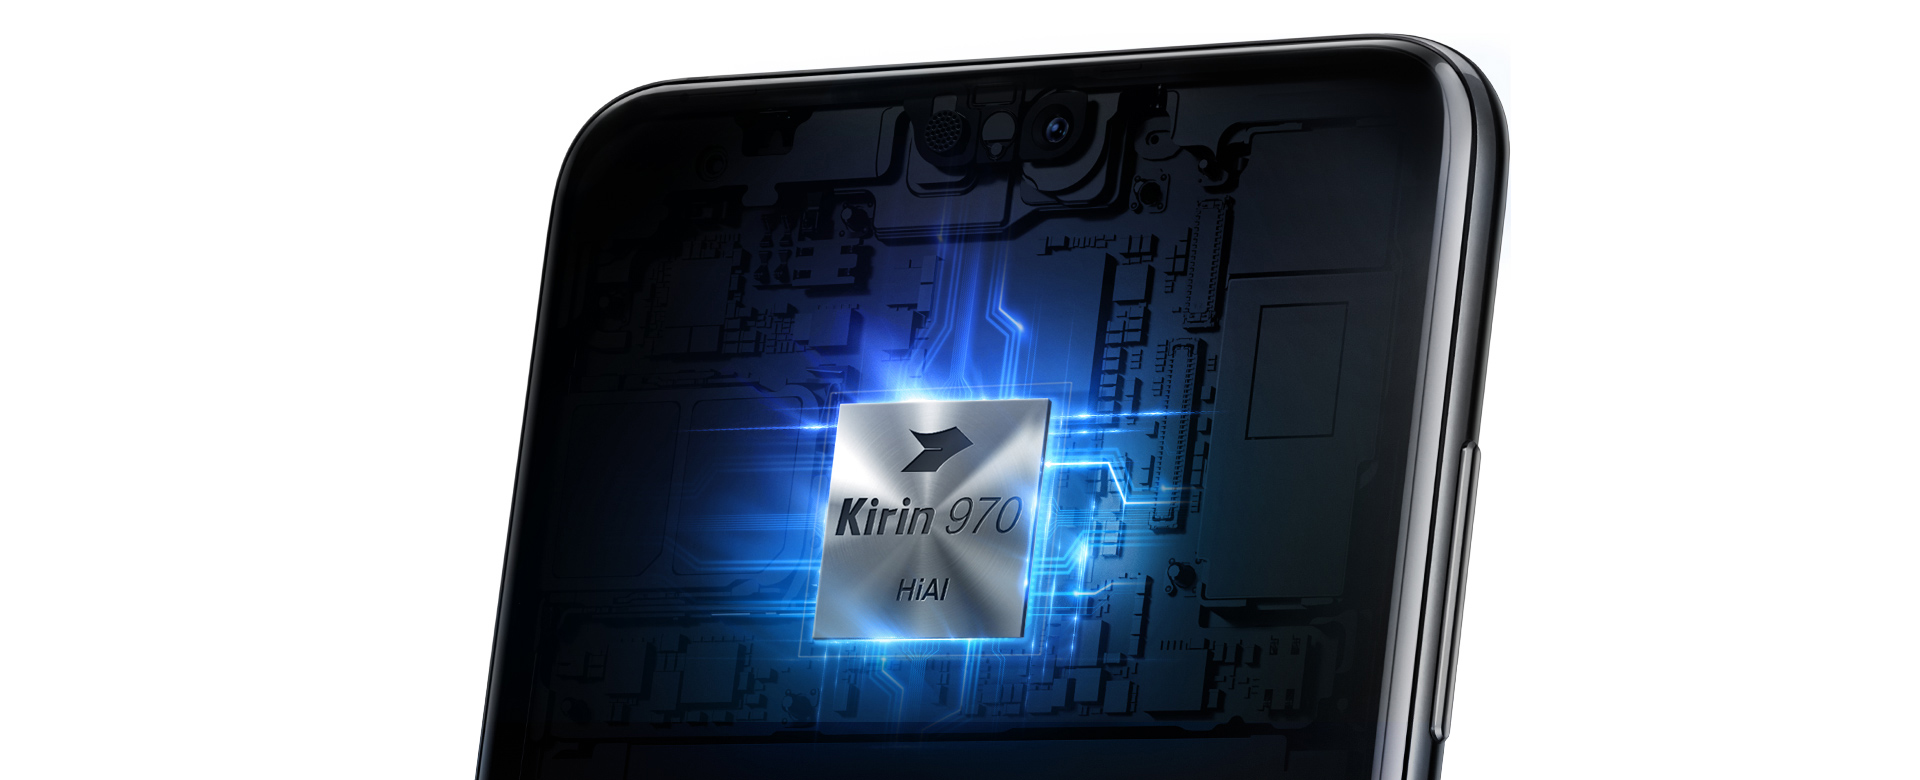 https://consumer-img.huawei.com/content/dam/huawei-cbg-site/common/mkt/pdp/phones/p20-pro-update1/img/performence/huawei-p20-pro-kirin-970-original.jpg